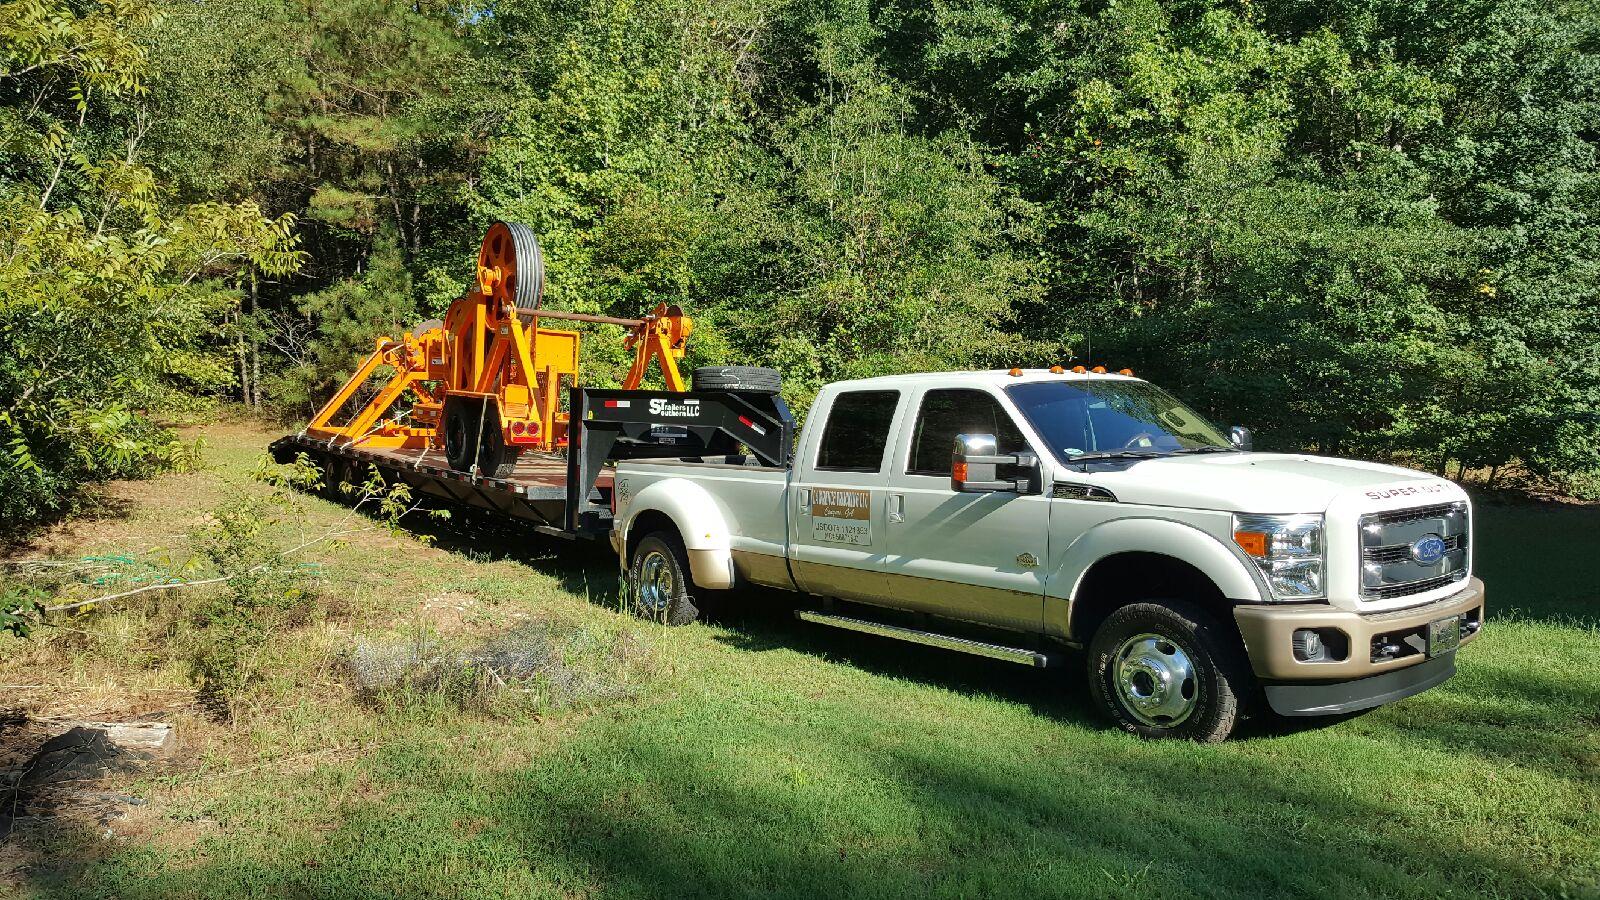 lawrence trucking llc image 0